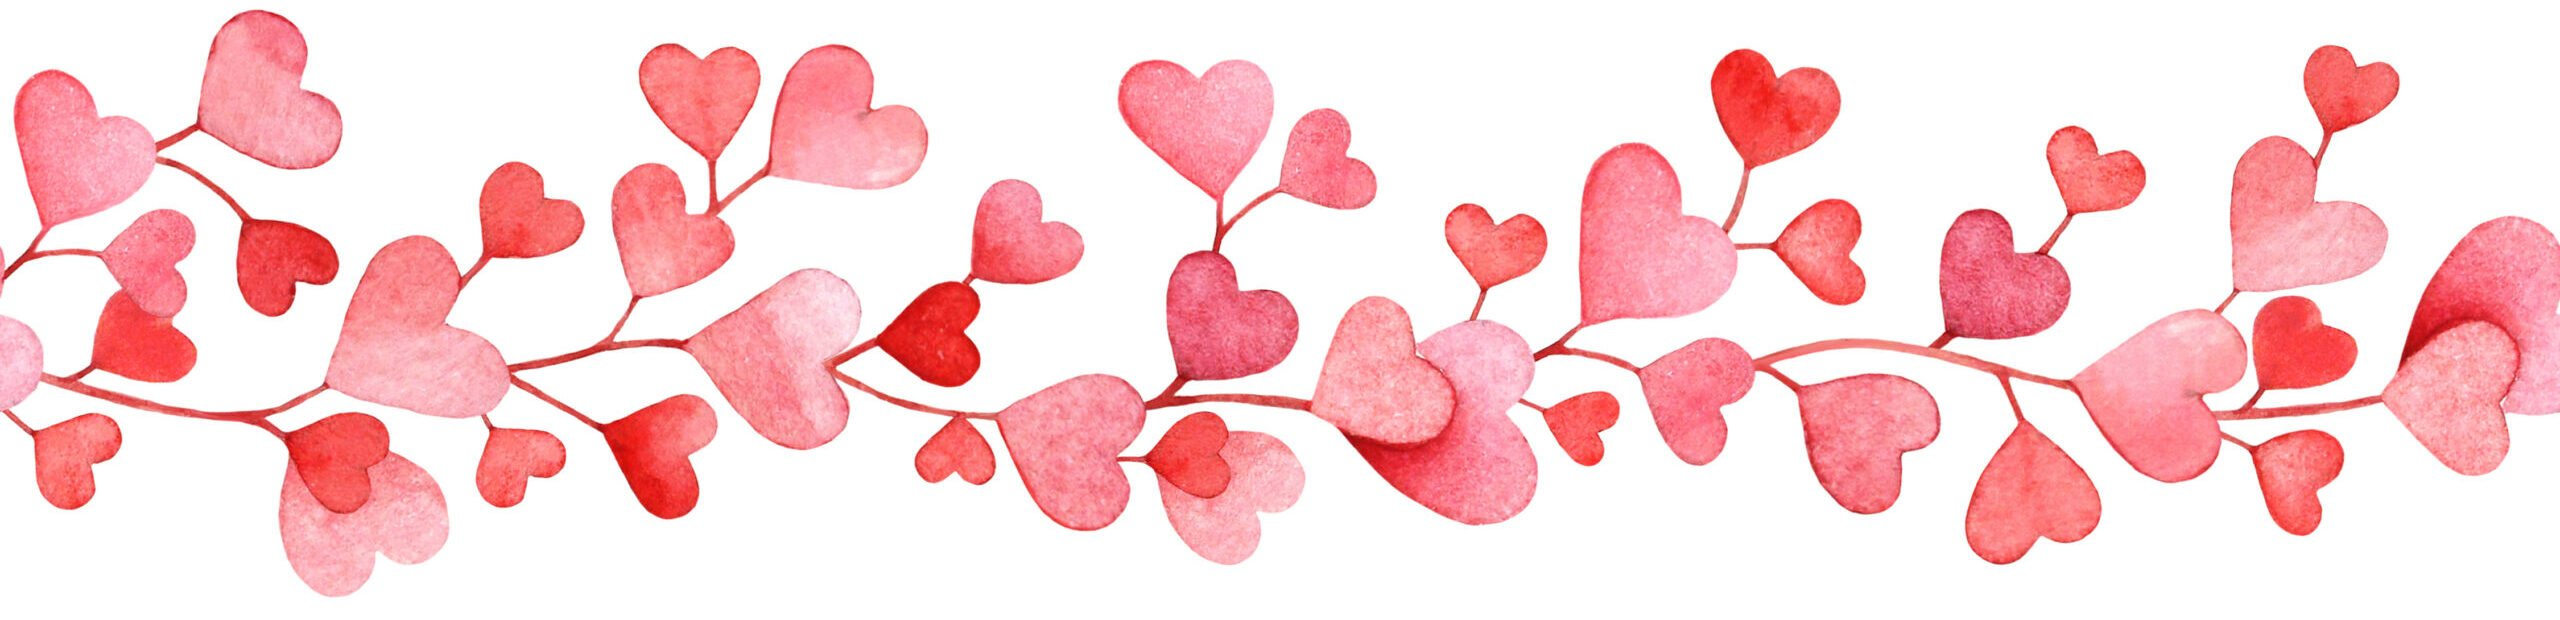 Kolorowanki serca